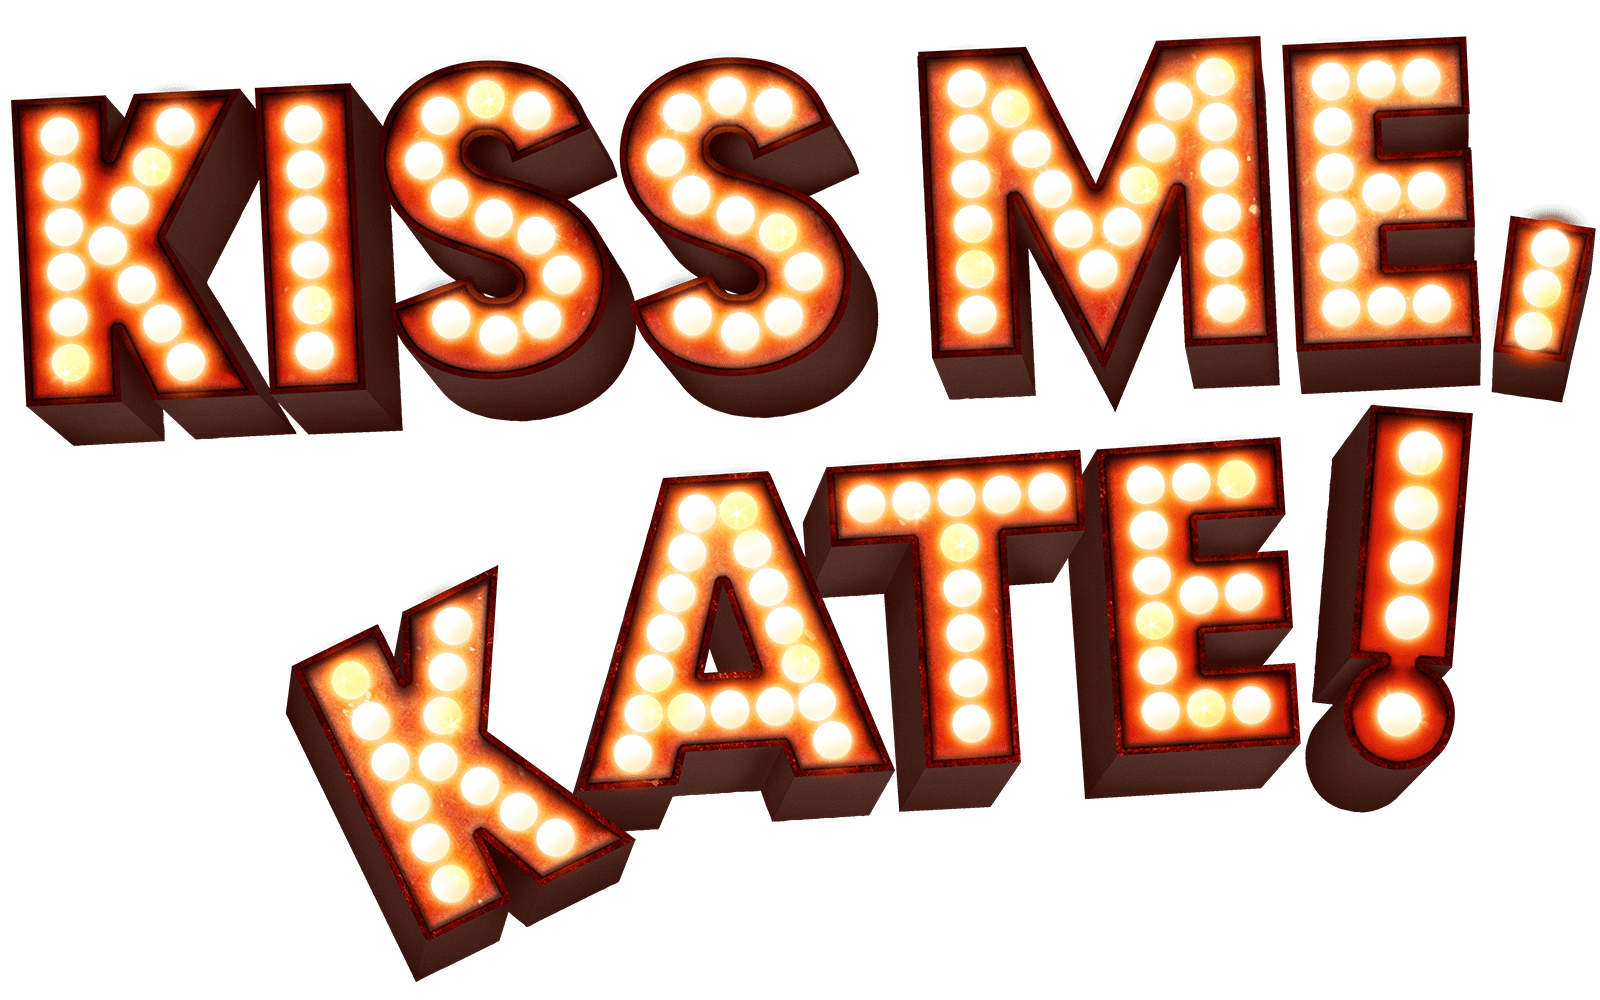 KMK_title-6.png